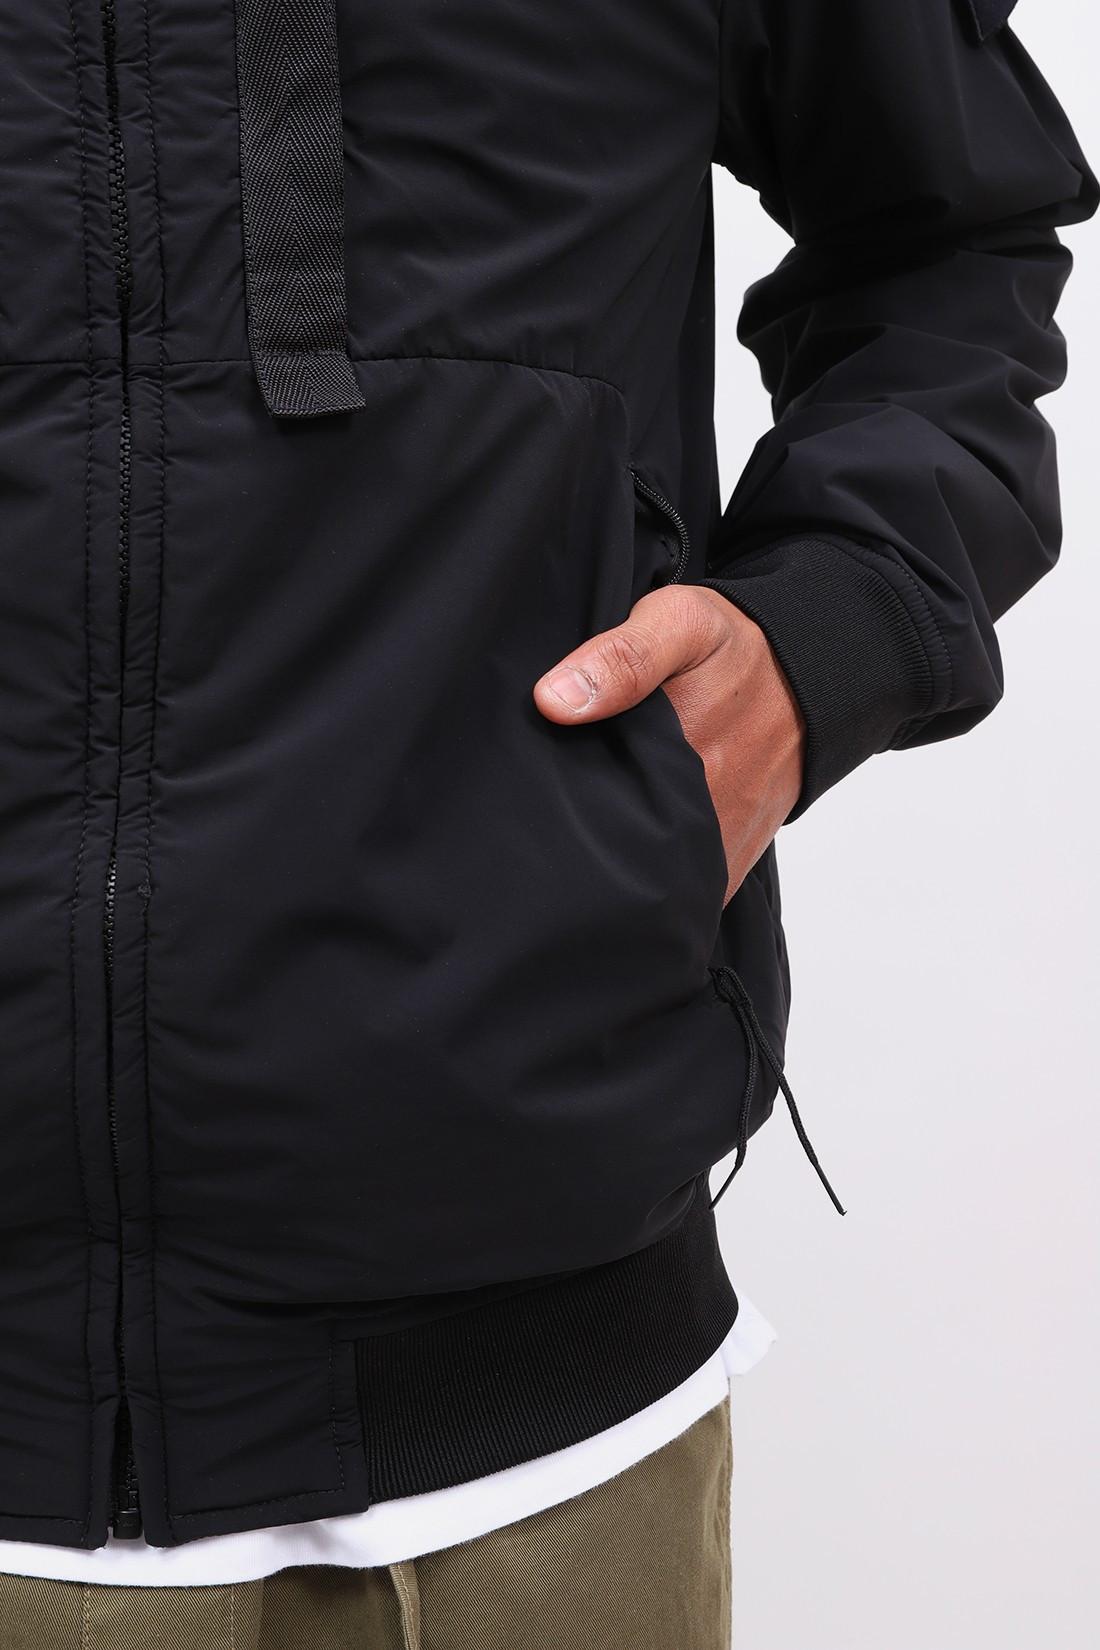 STONE ISLAND / 42631 nylon-tc jacket v0029 Nero